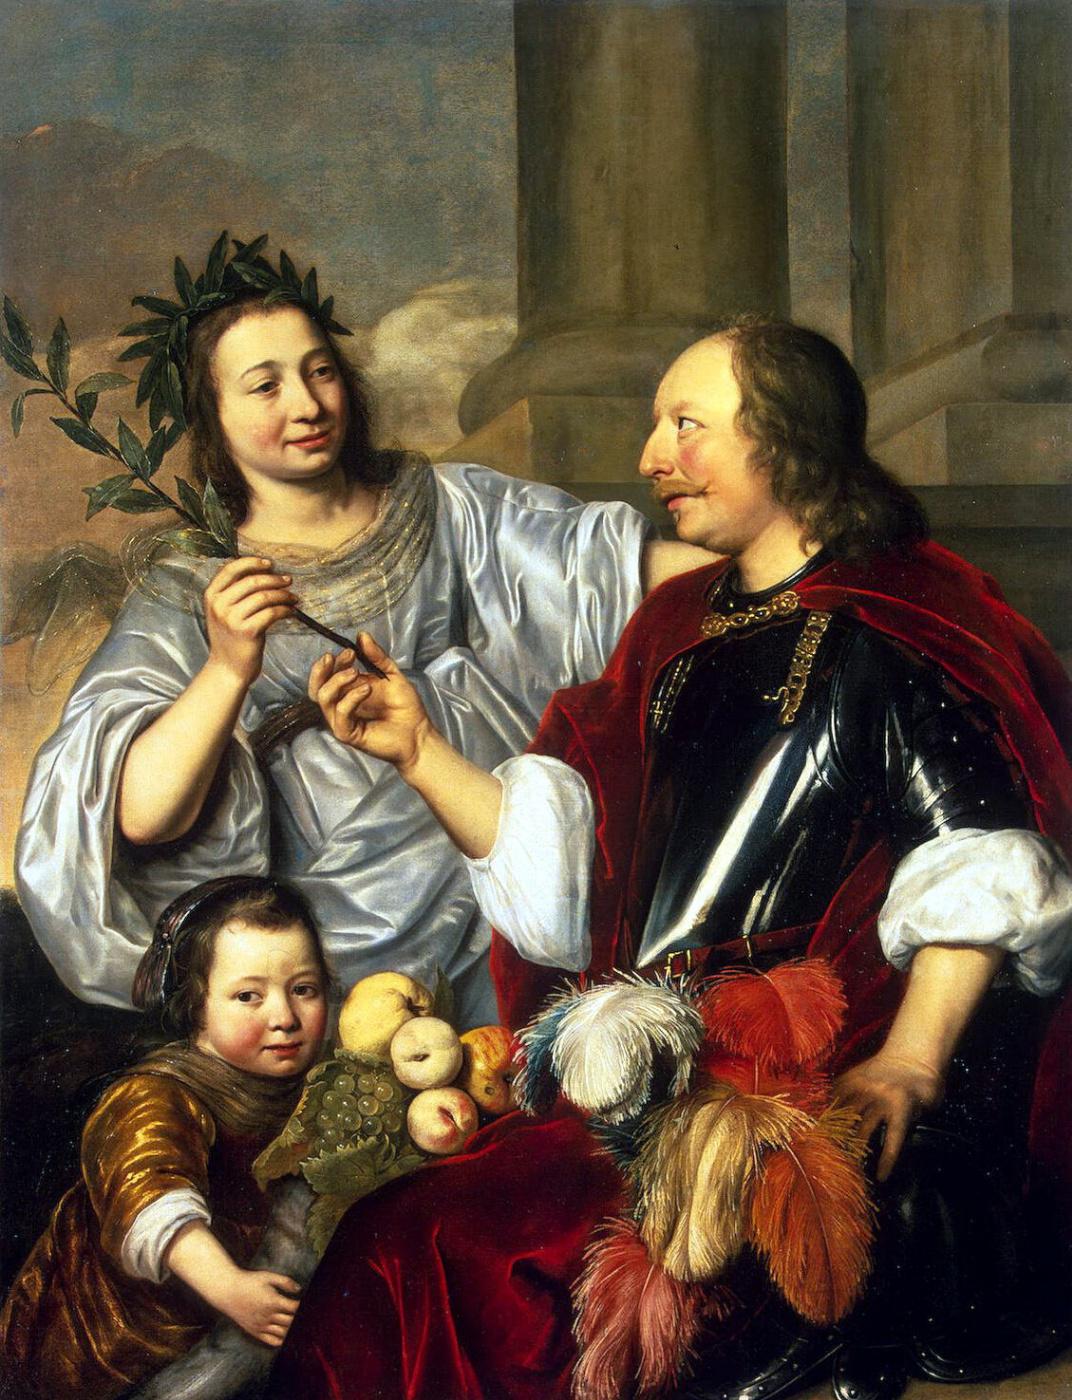 Jan de Bry. Allegorical family portrait